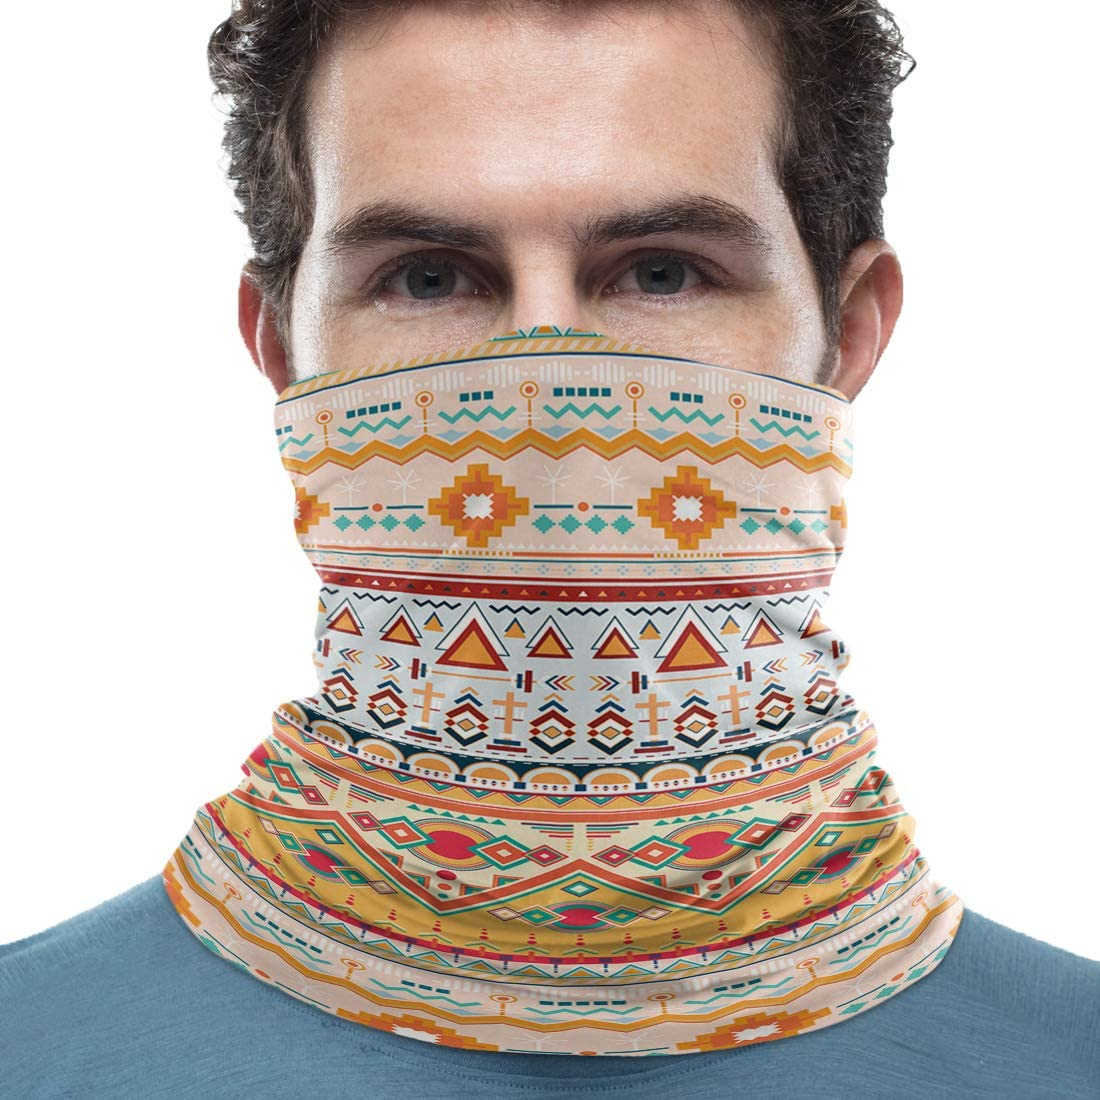 Women/Men Scarf Outdoor Bandana Headwear Sports Tube UV Face Cover for Workout Yoga Running Sleeping Sloth